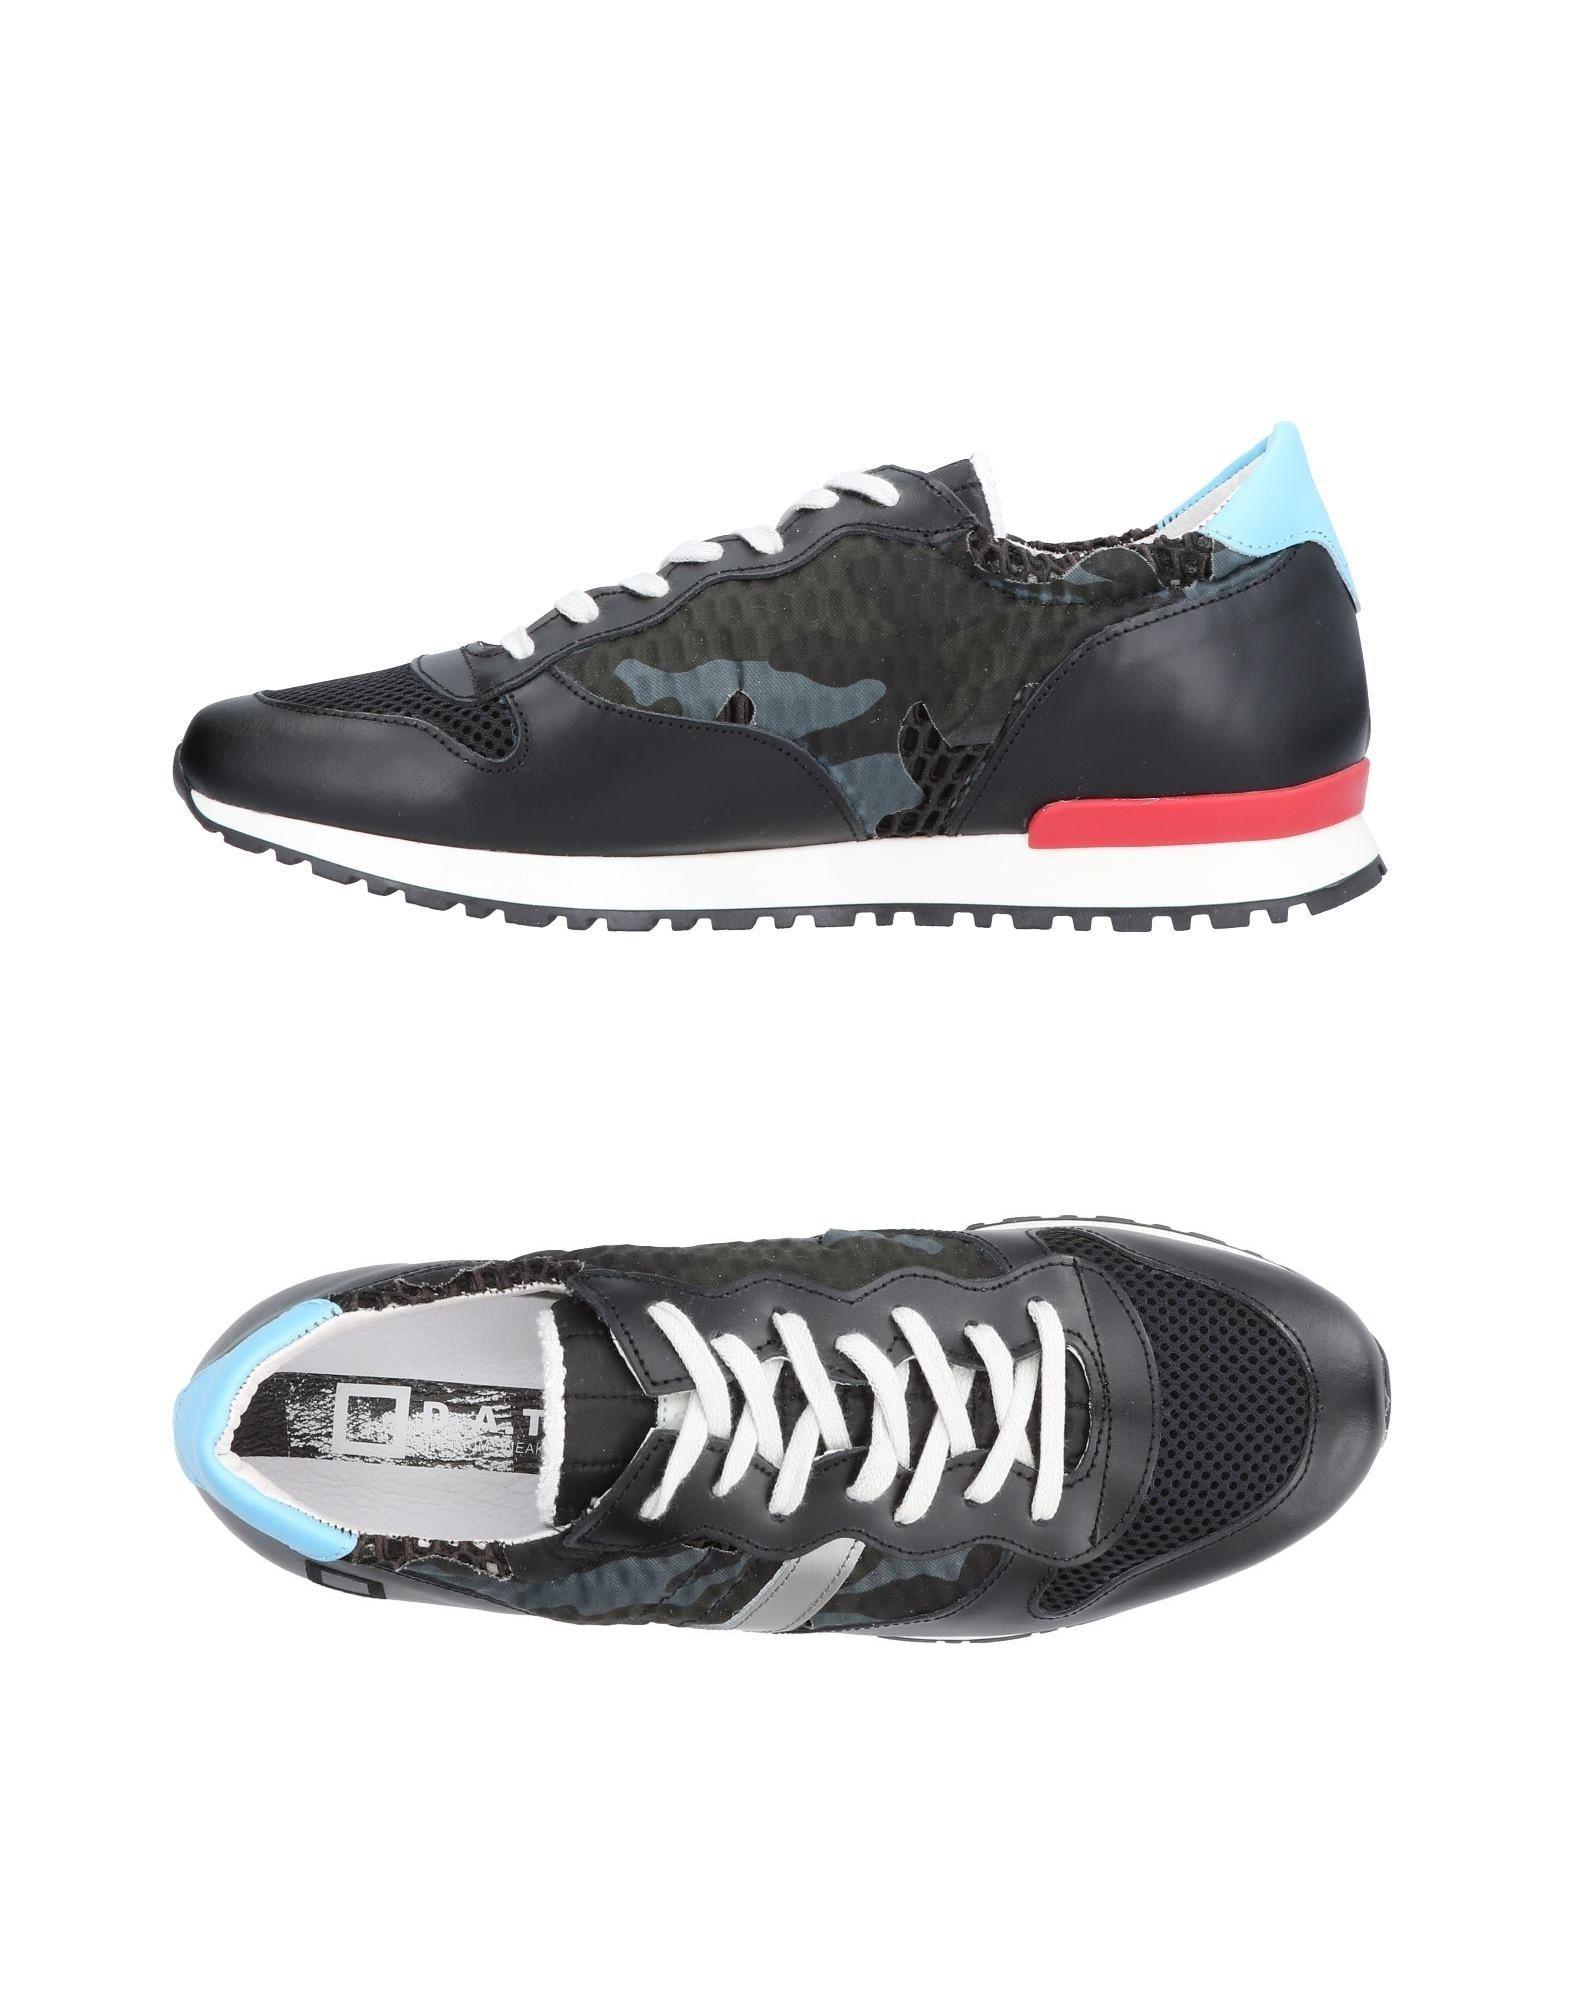 D.A.T.E. Sneakers 11482437AX Herren  11482437AX Sneakers Heiße Schuhe 6ff54e